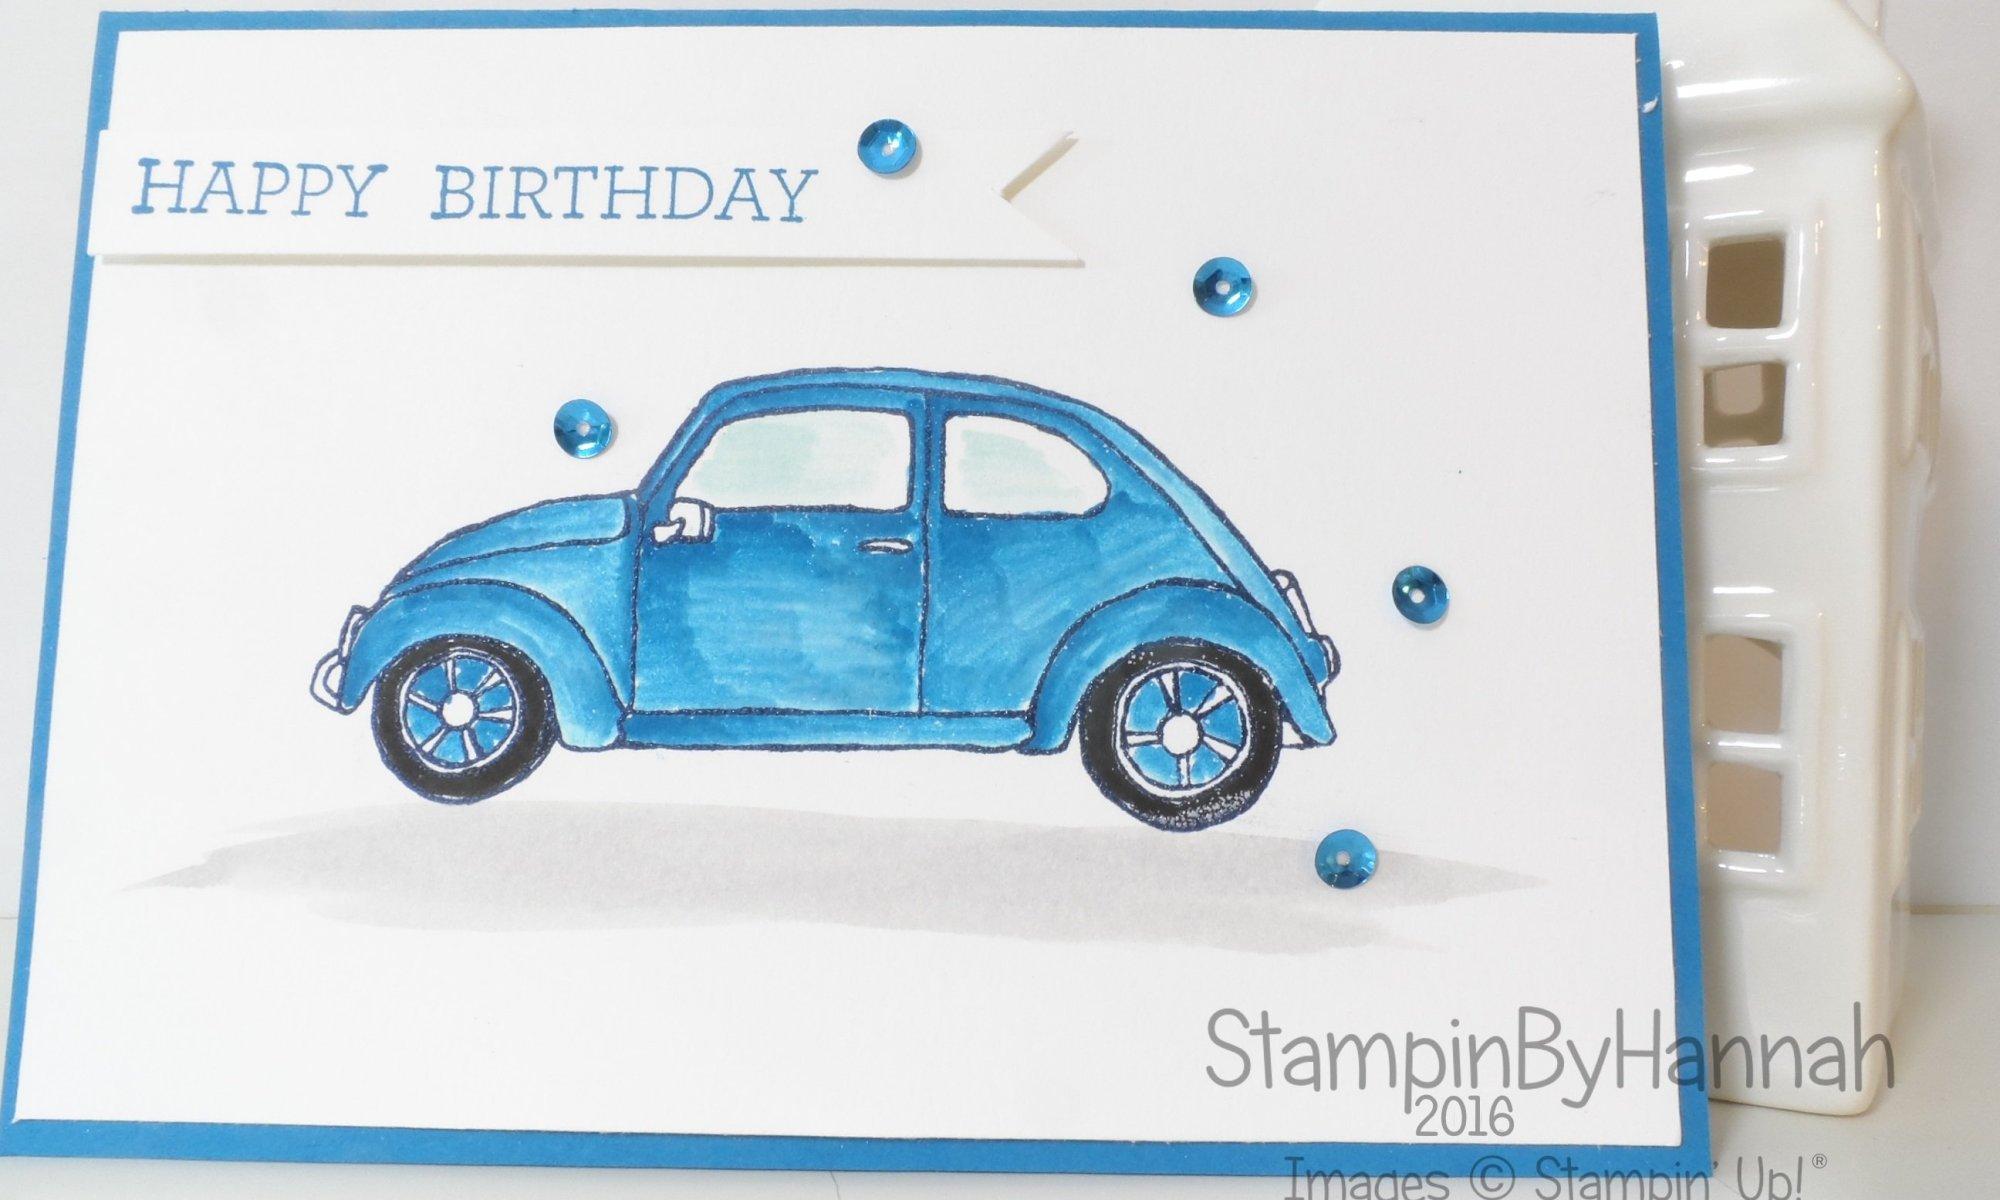 Stampin' Up! UK Beautiful Ride mans birthday card